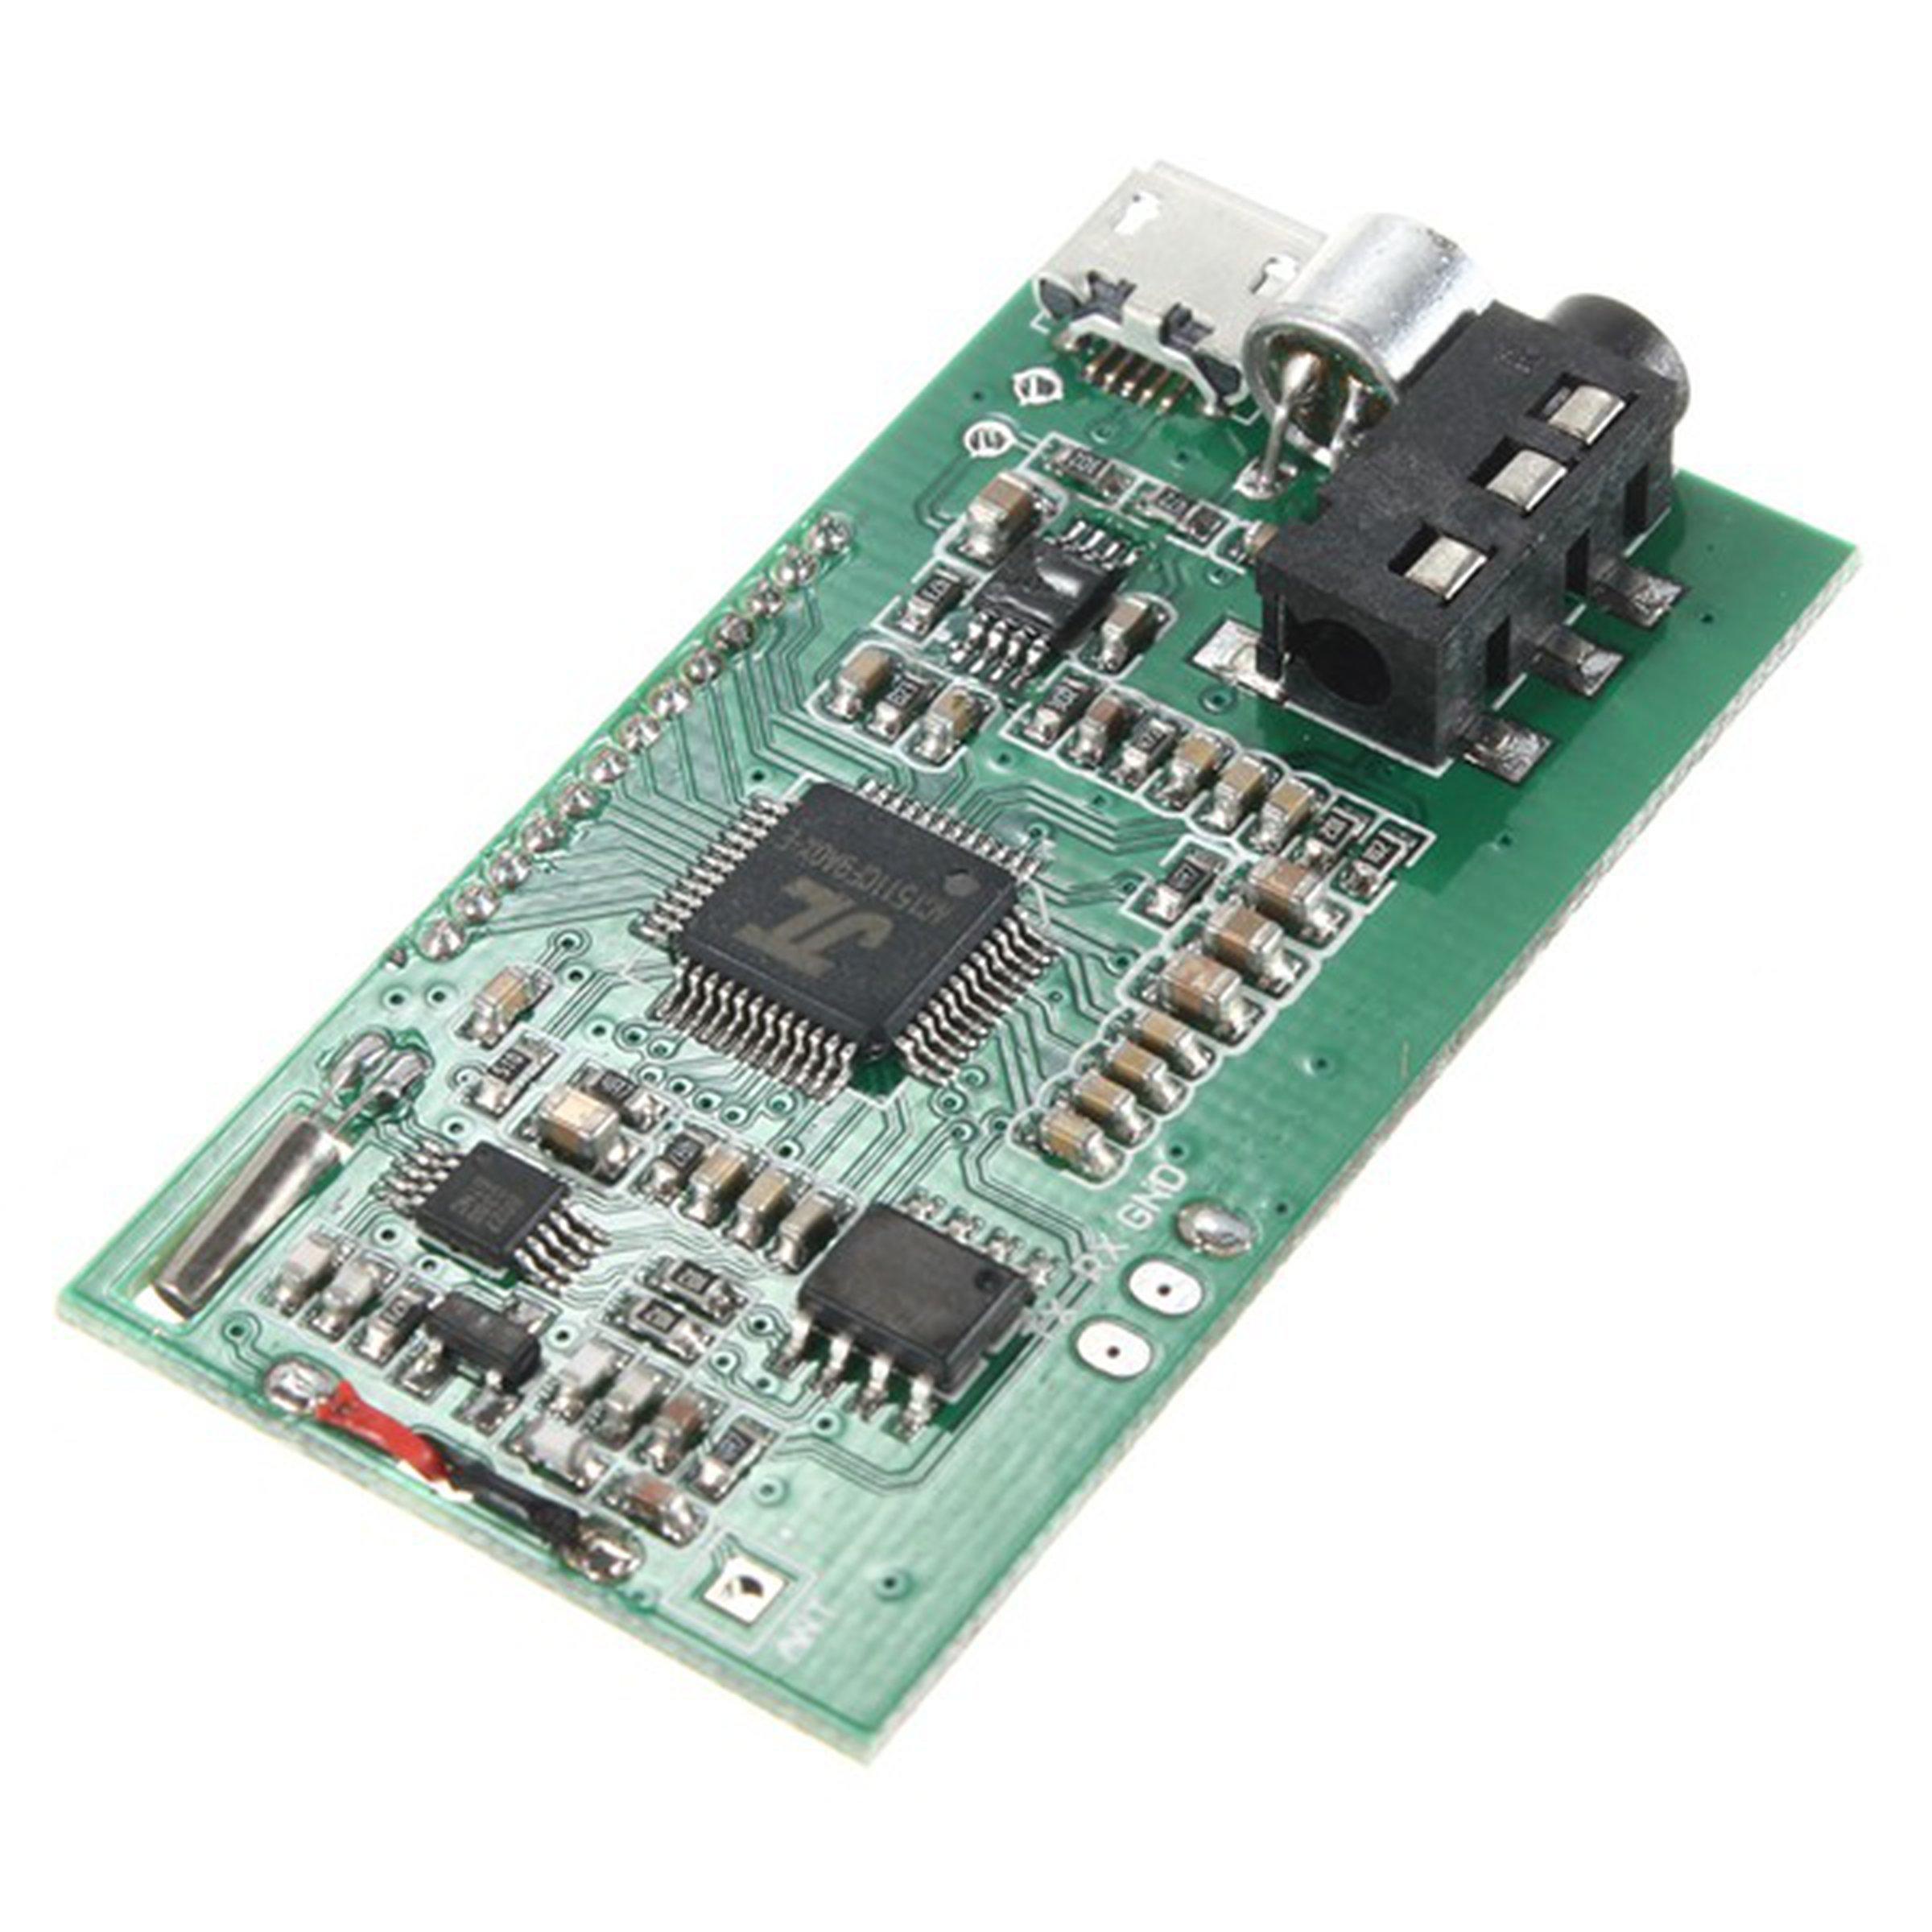 Usb Fm Transmitter Circuit In 2018 Electronics T Diagram Dsp Pll Module Aux 100mw 6